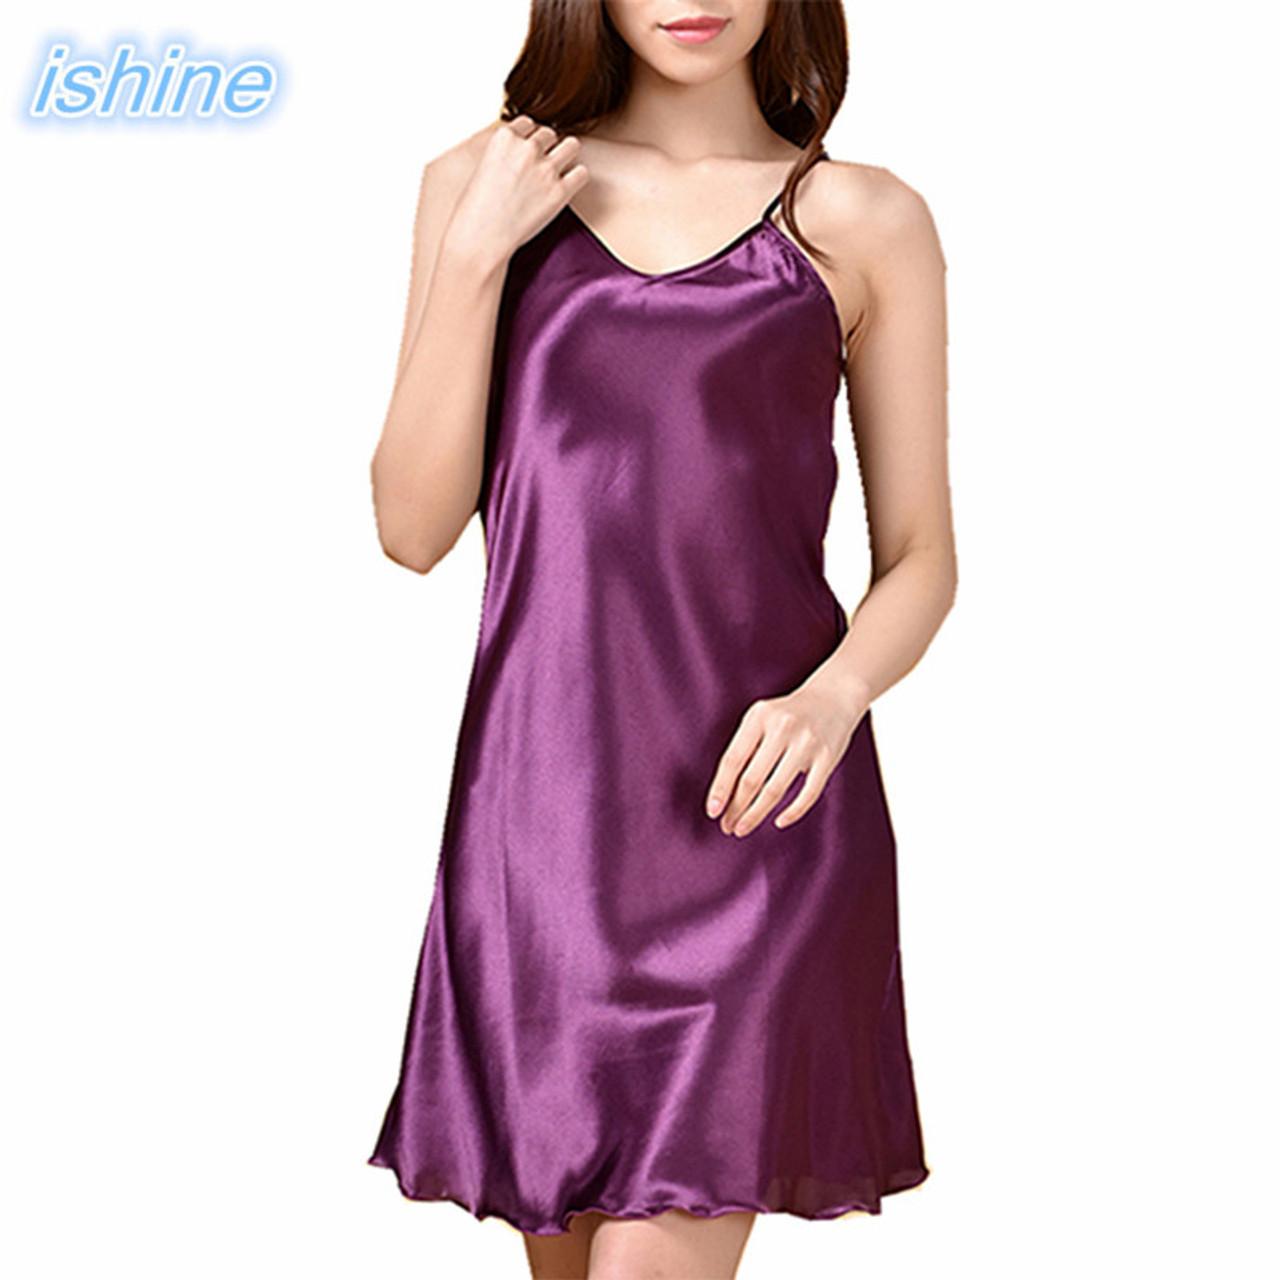 08a46e43c259 Satin Silk Nightwear Women Nightgowns Sexy V-neck Sleepwear Sleeping Dress  Red Nightdress 2018 Summer ...